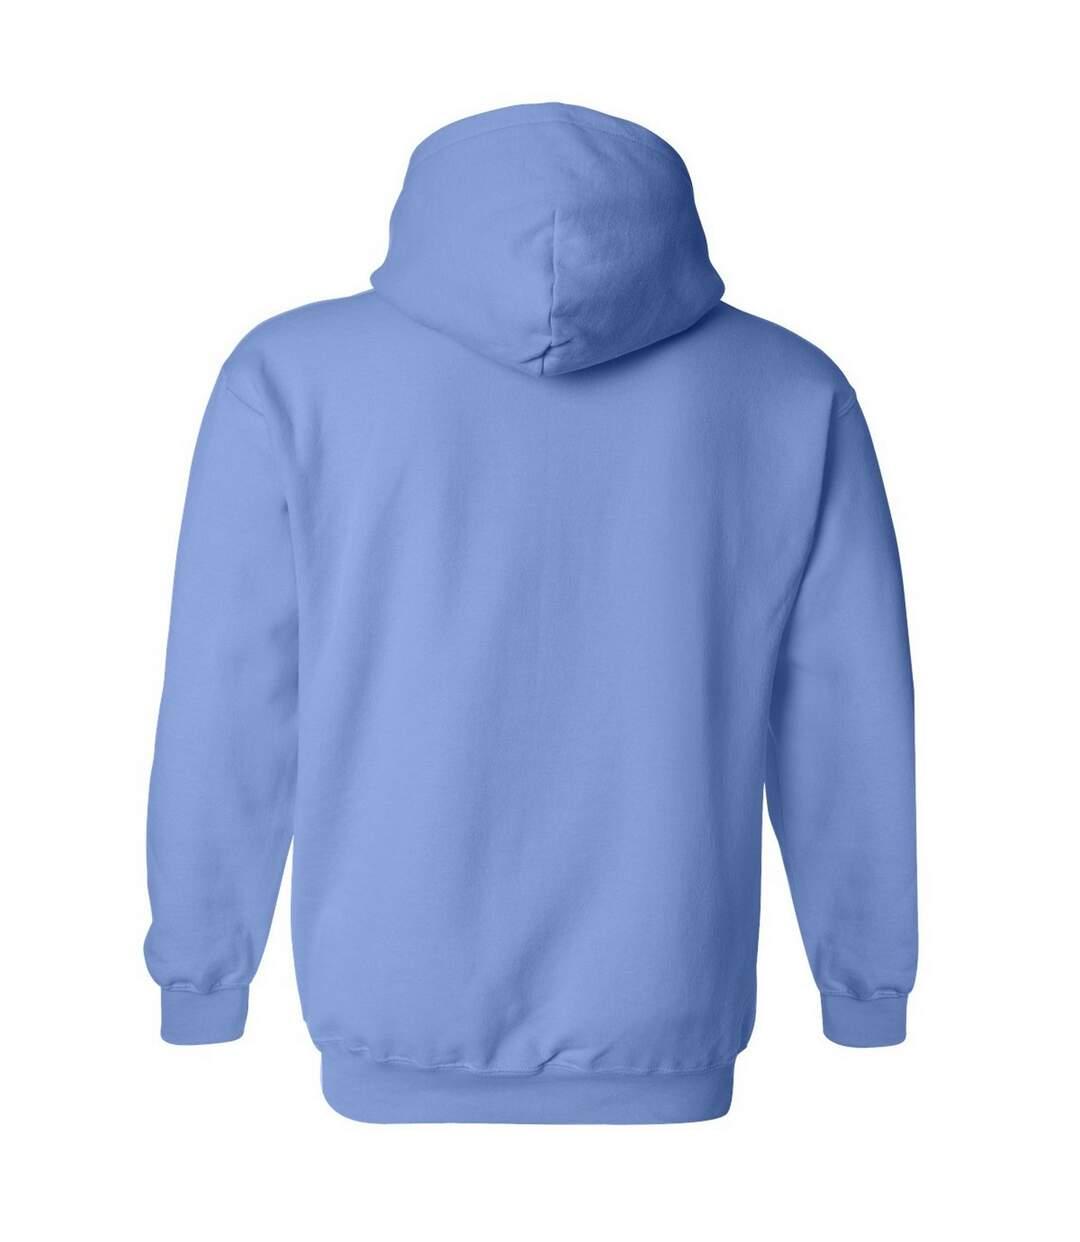 Gildan Heavy Blend Adult Unisex Hooded Sweatshirt / Hoodie (Carolina Blue) - UTBC468